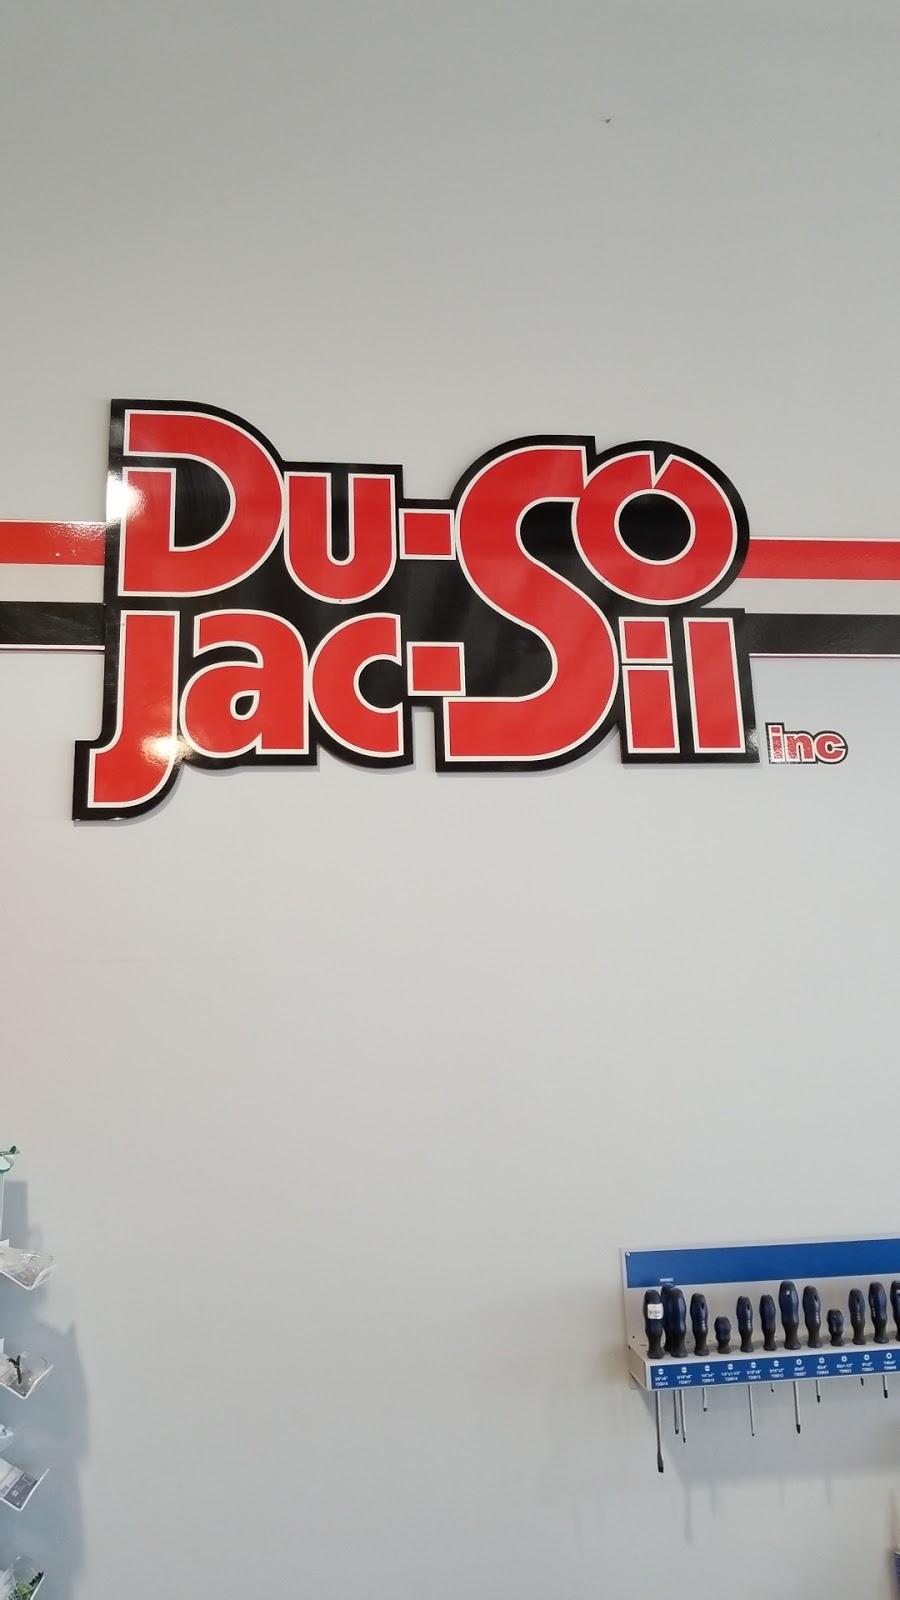 Du-So/Jac-Sil Inc   car repair   433 Boulevard Armand-Paris, Québec, QC G1C 7R3, Canada   4186615276 OR +1 418-661-5276